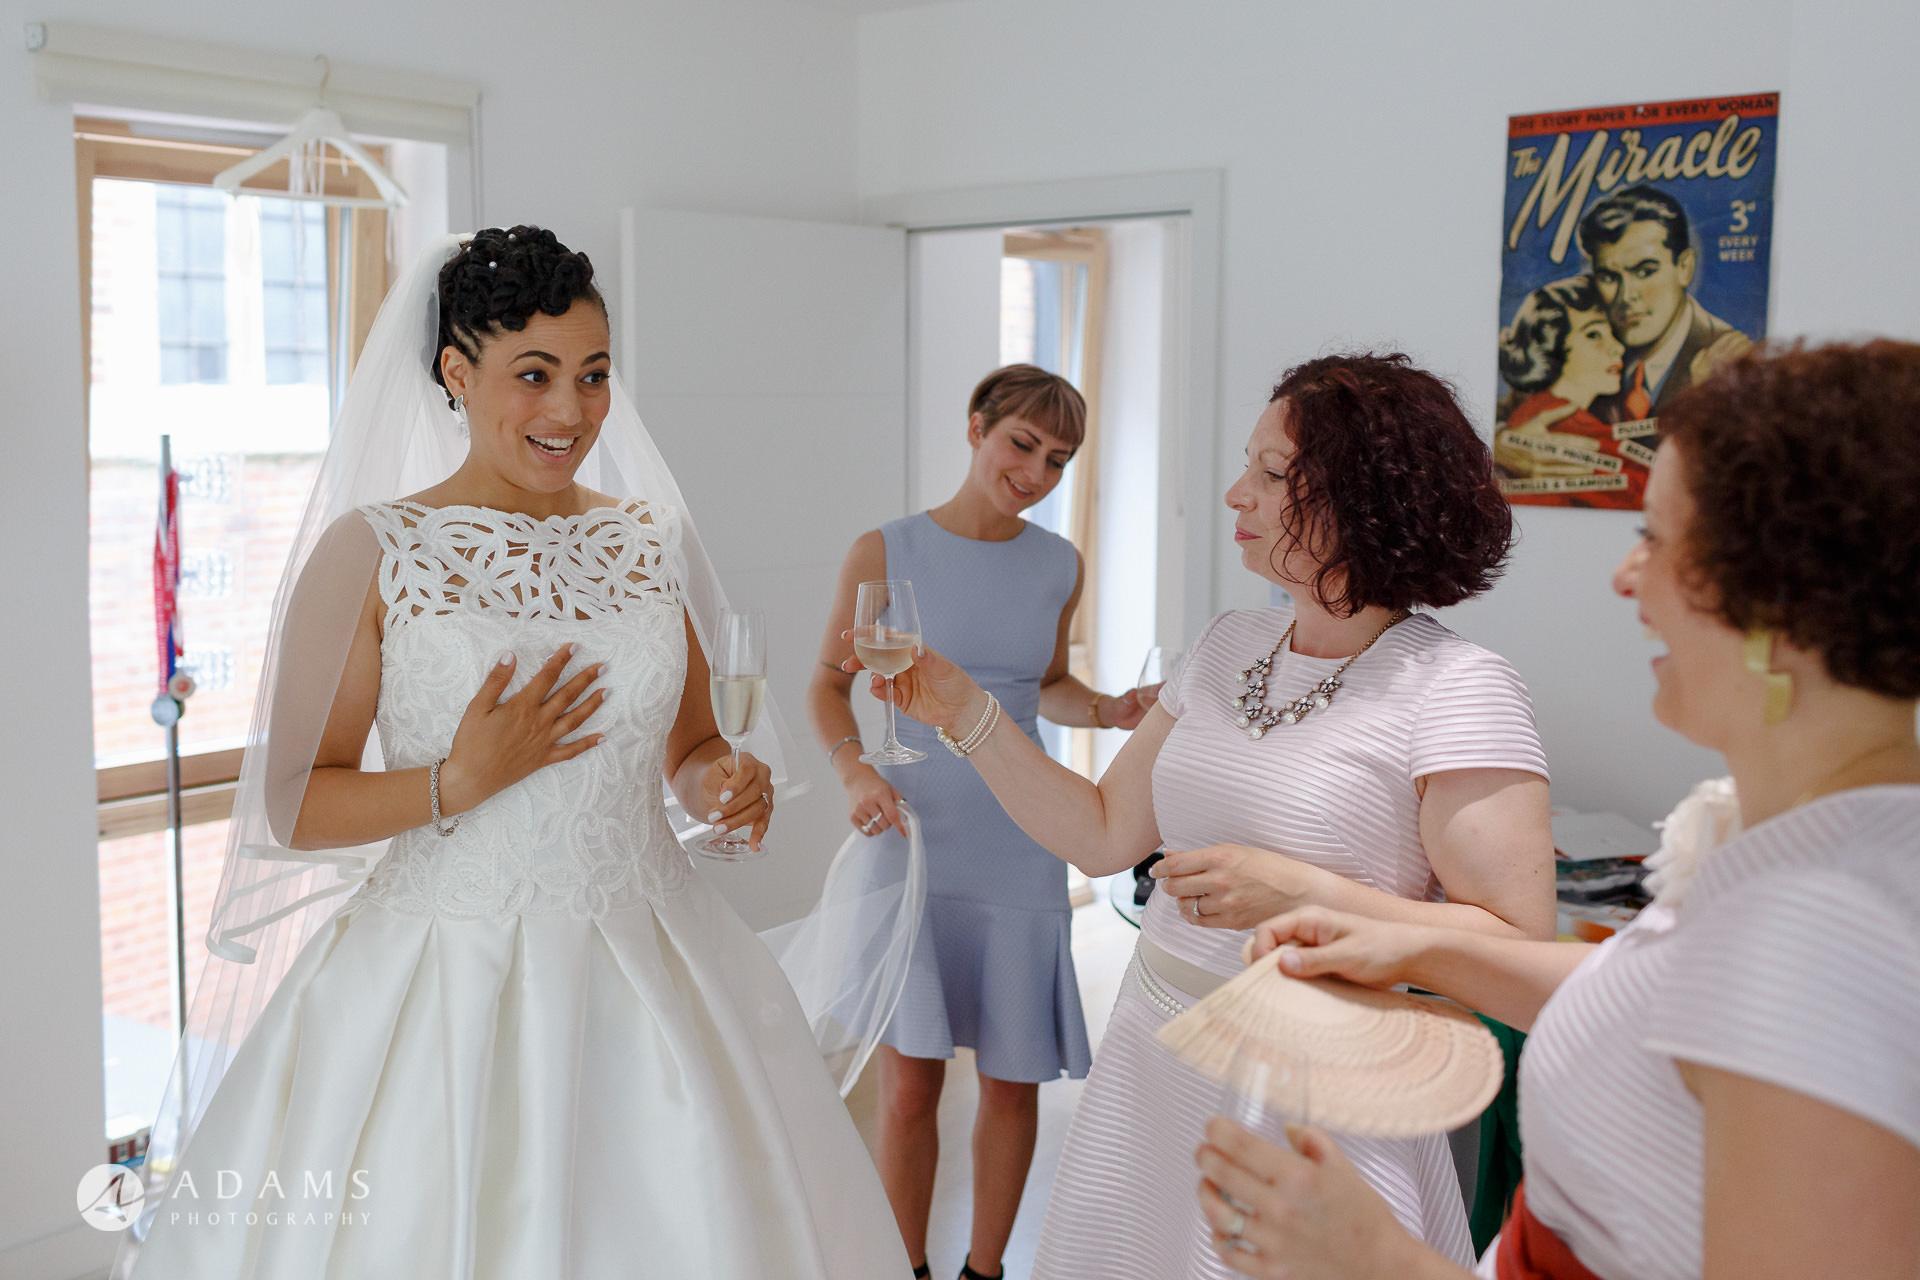 Morden Hall Wedding bride and her bridesmaid chatting